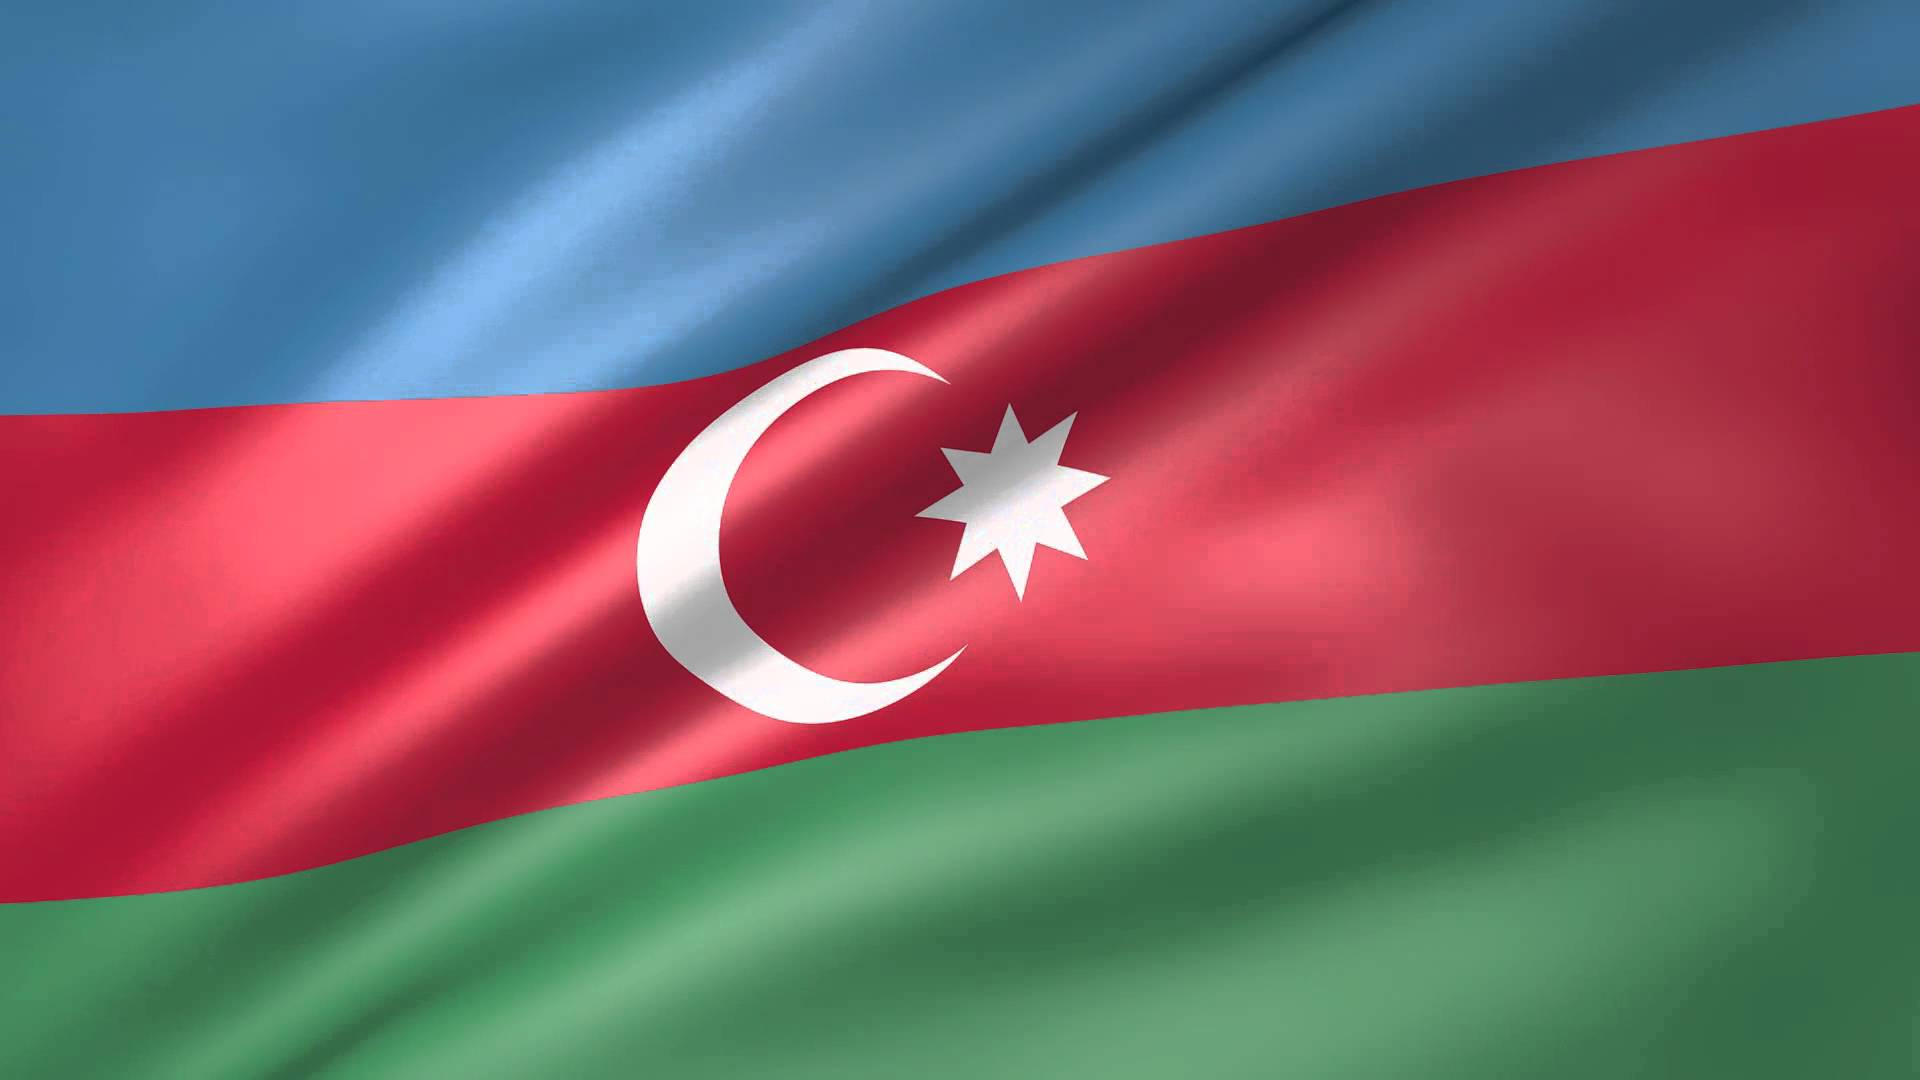 Images of Flag Of Azerbaijan | 1920x1080